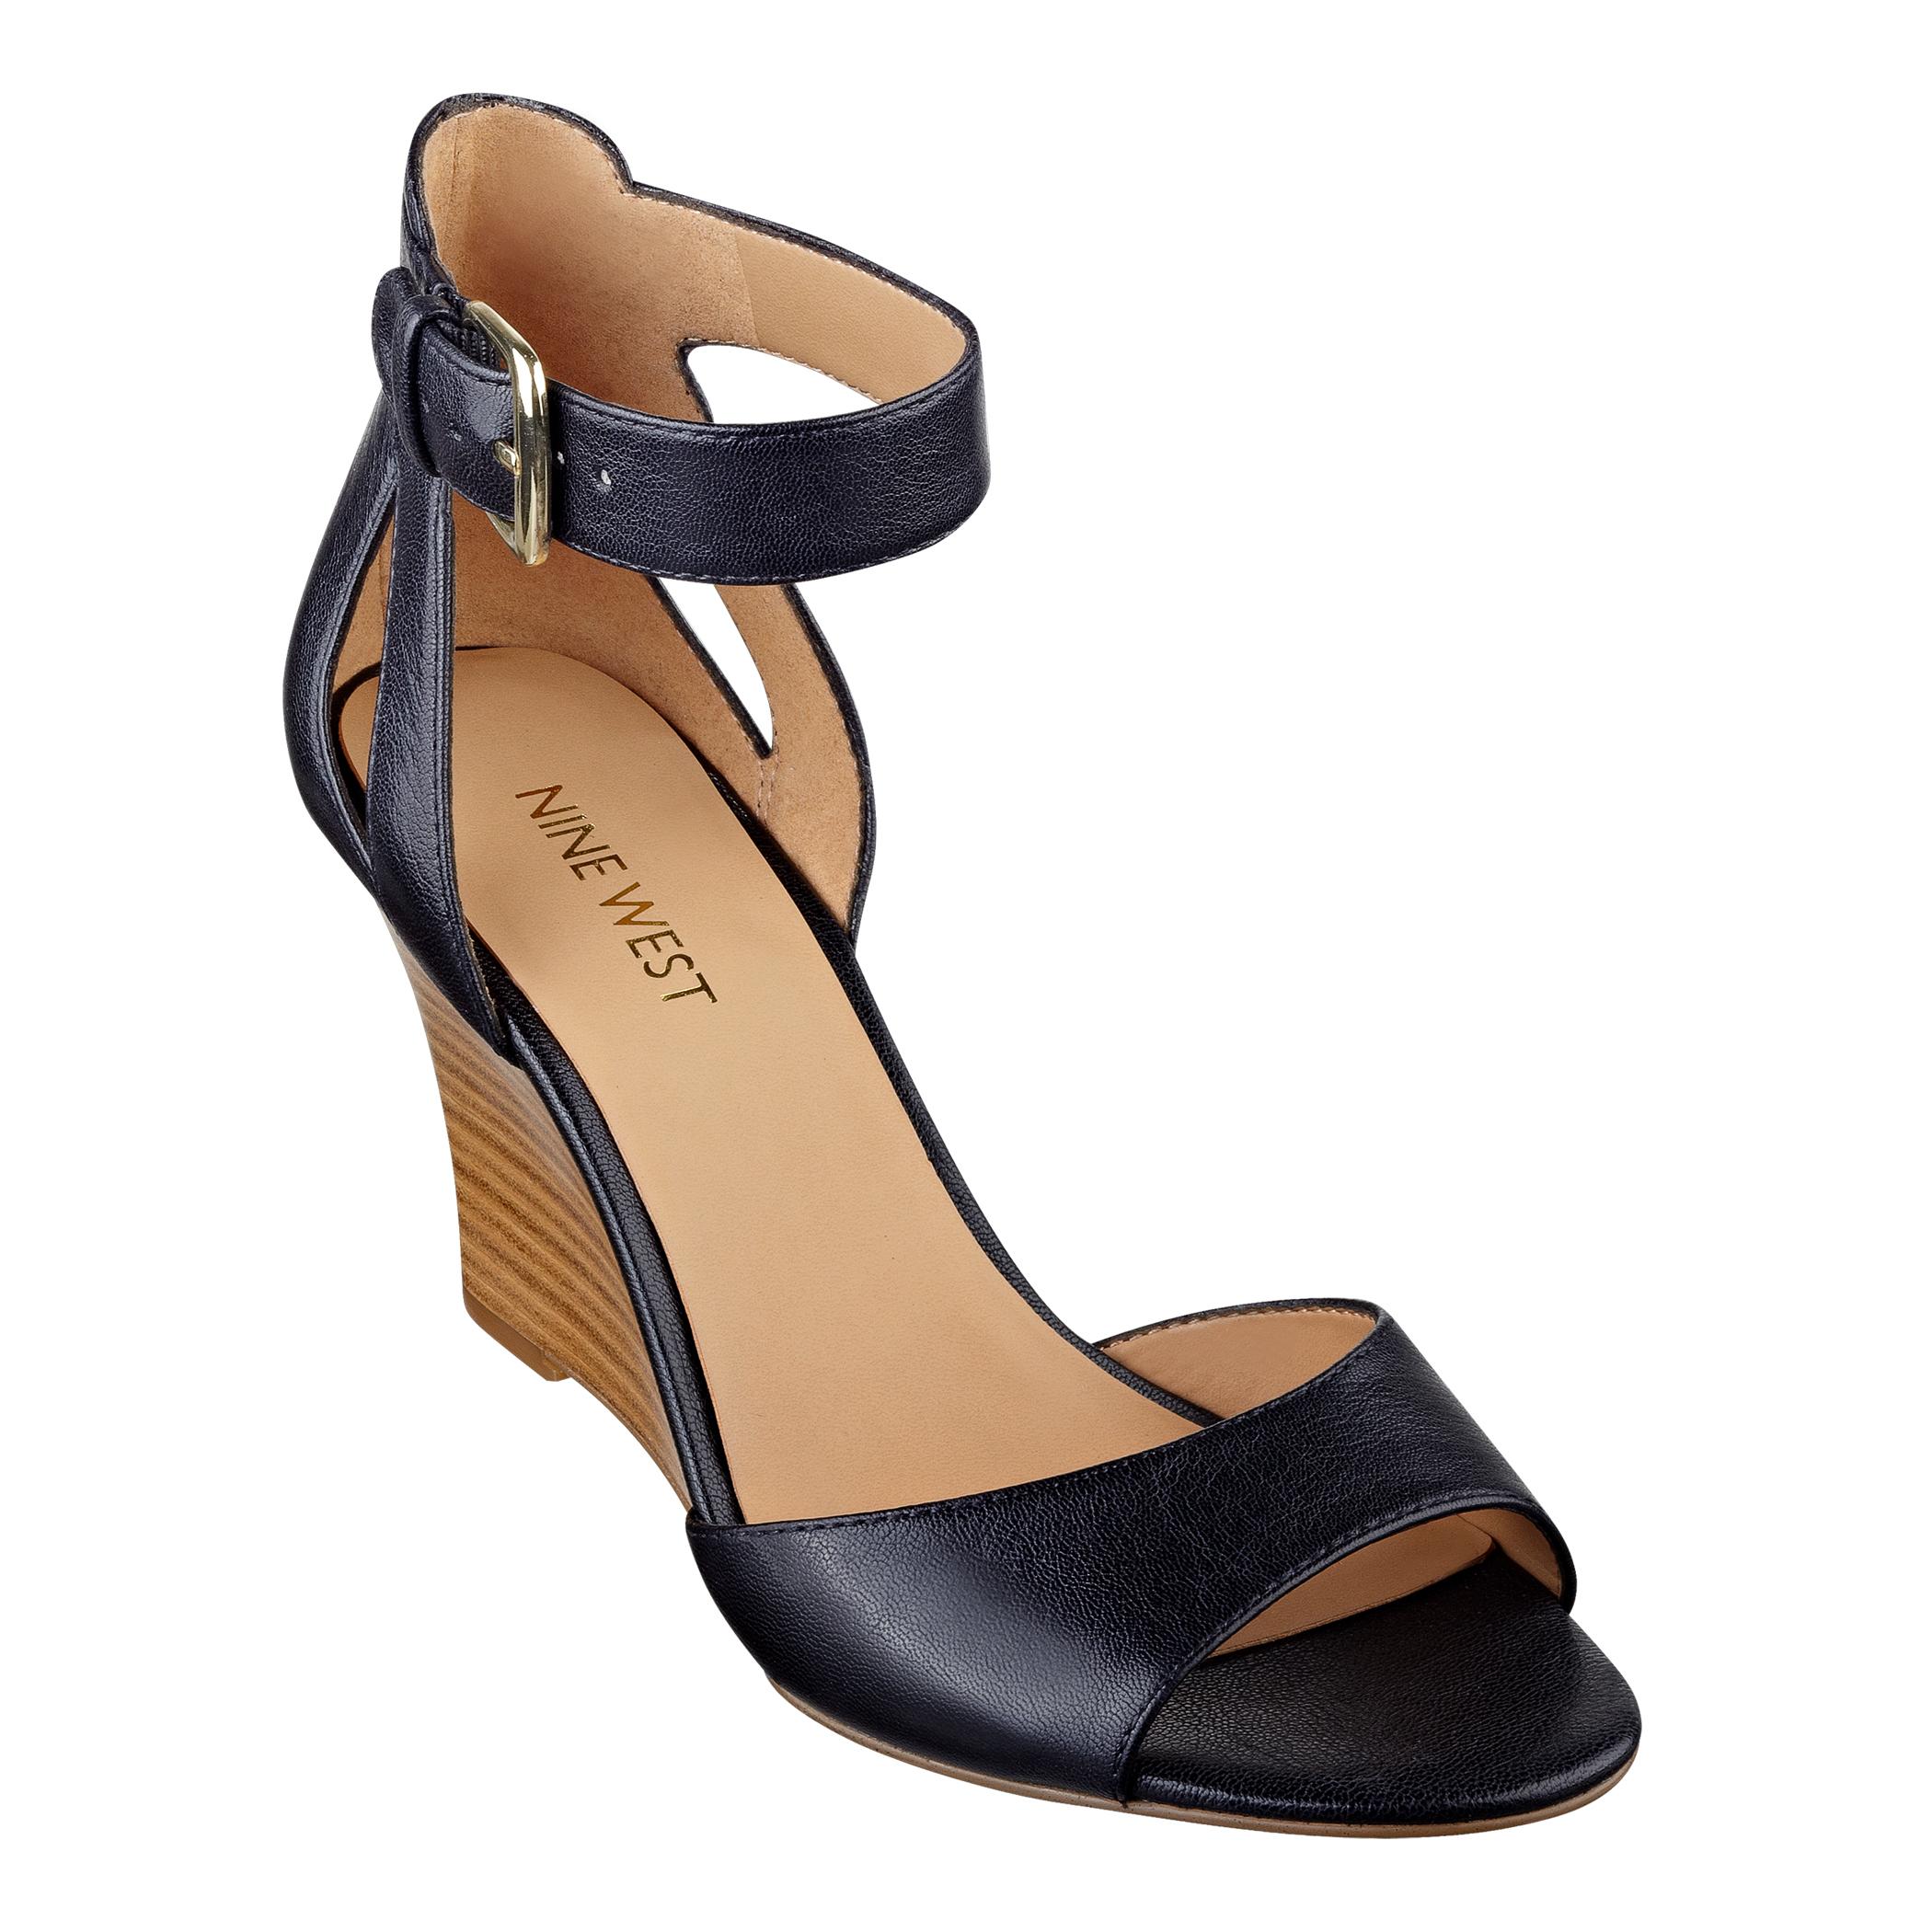 037fdd1422 Nine West Floyd Ankle Strap Wedge Sandals in Black - Lyst